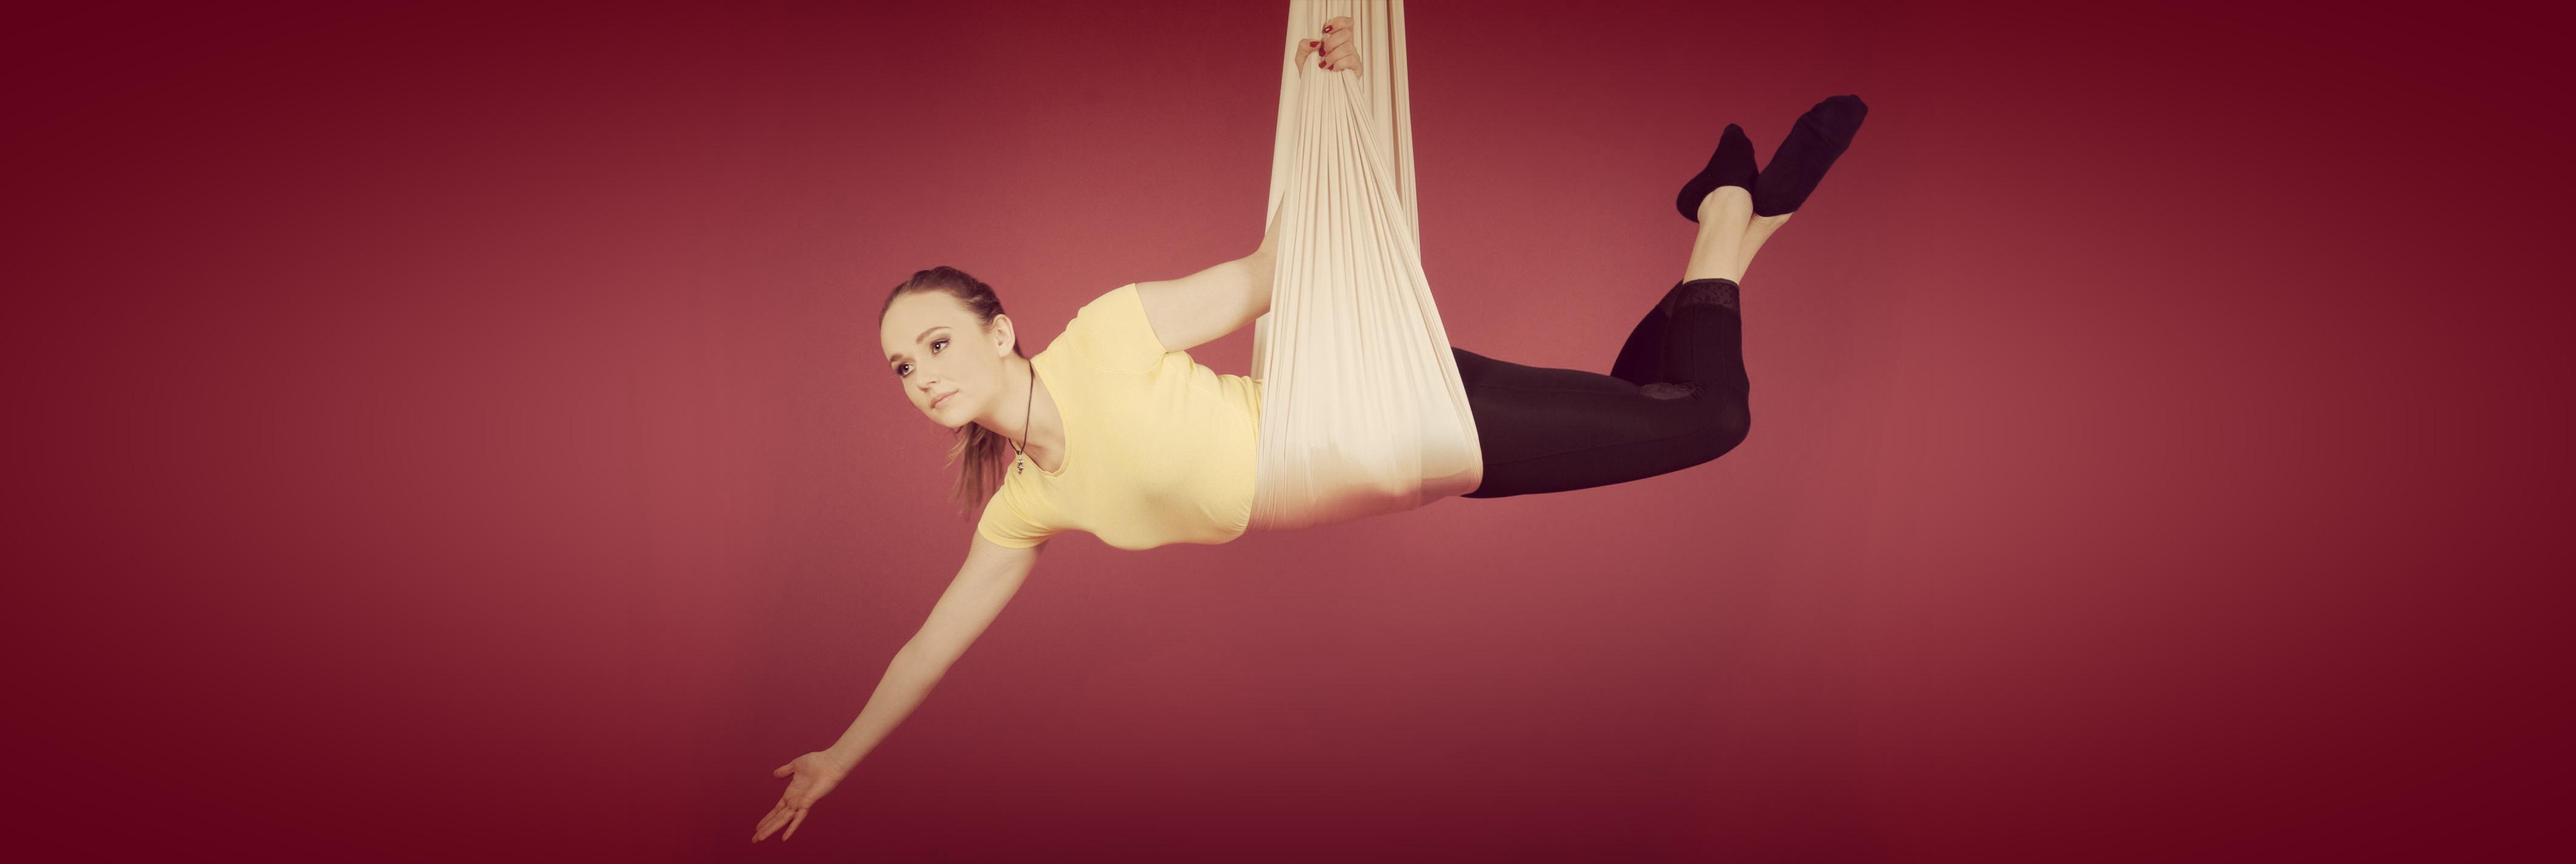 Studio-Elodie-Murnau-Aerial-Yoga-06